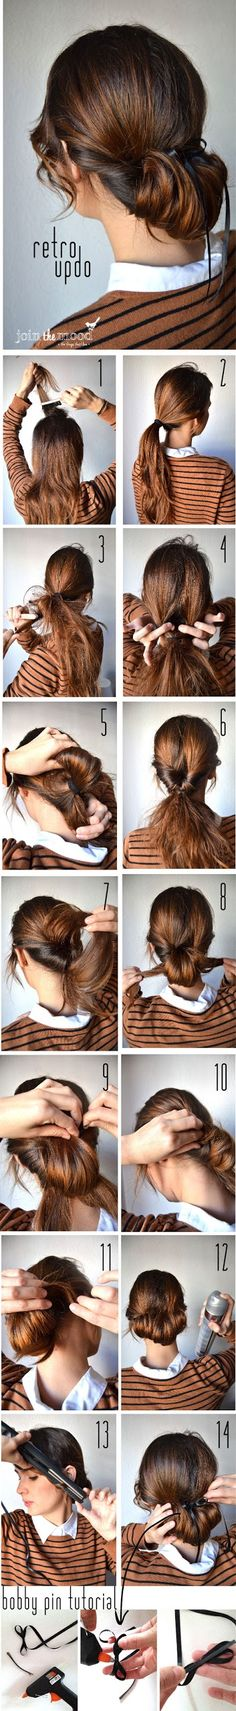 Make A Retro UpDo | hairstyles tutorial